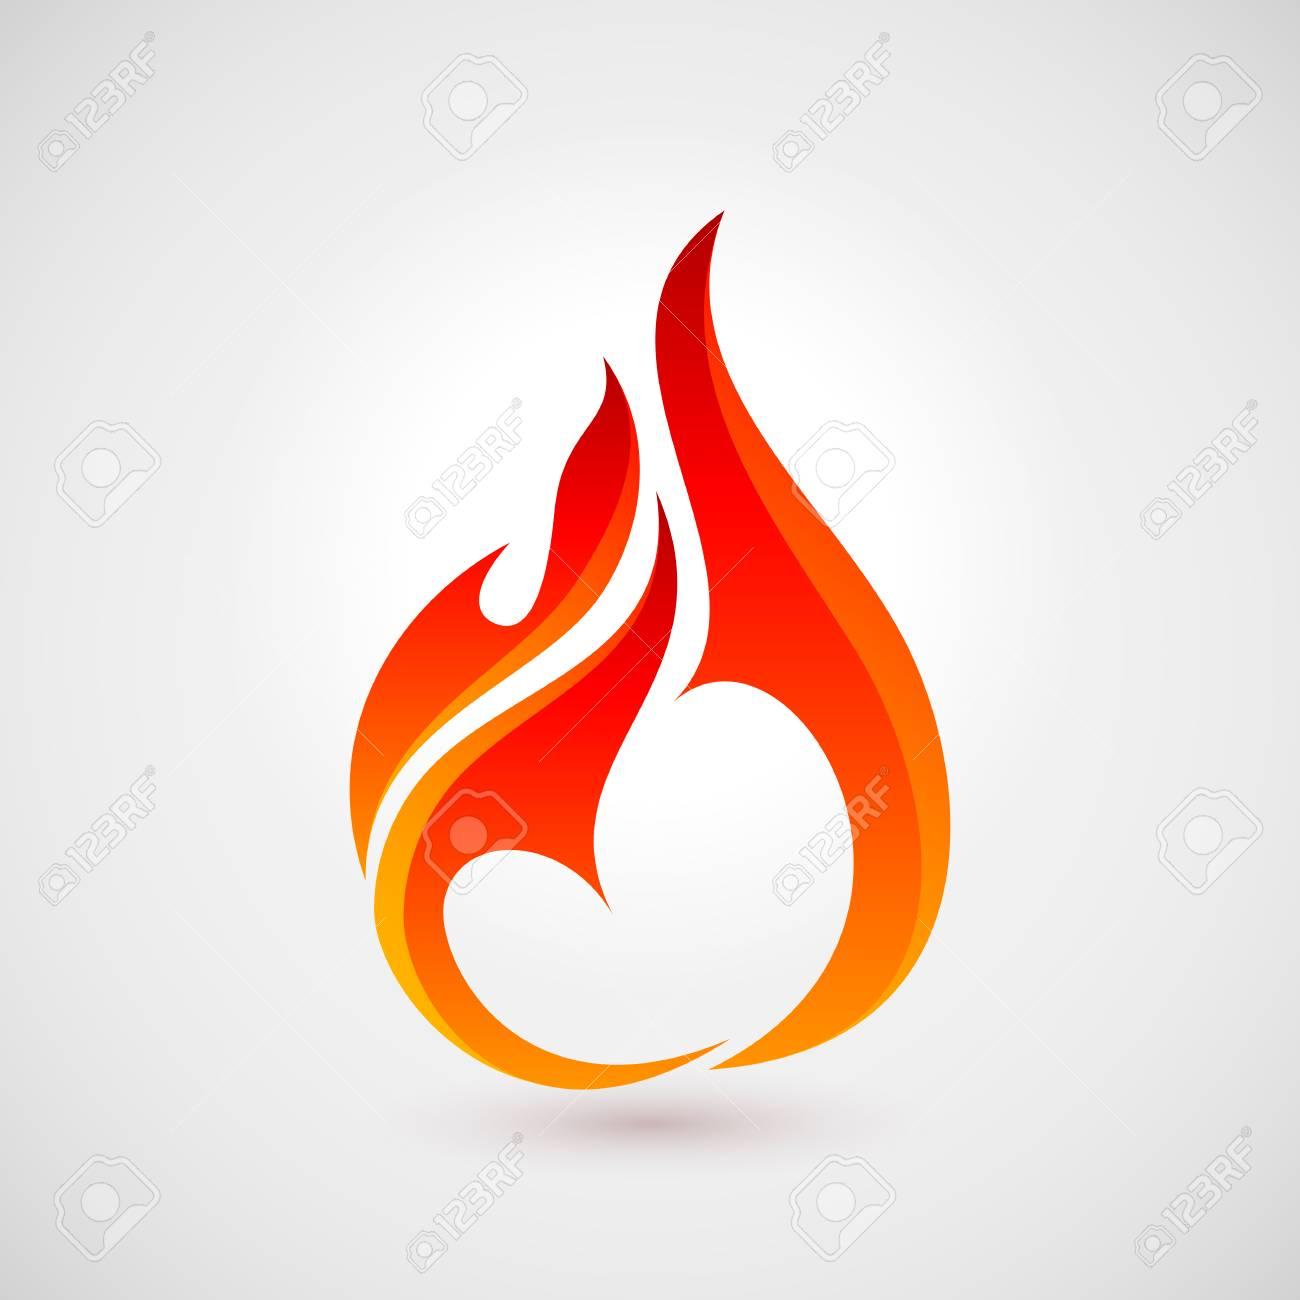 Fire Flames in Heart Shape. Logo Design Template. Icon Illustration for Design - 76324329